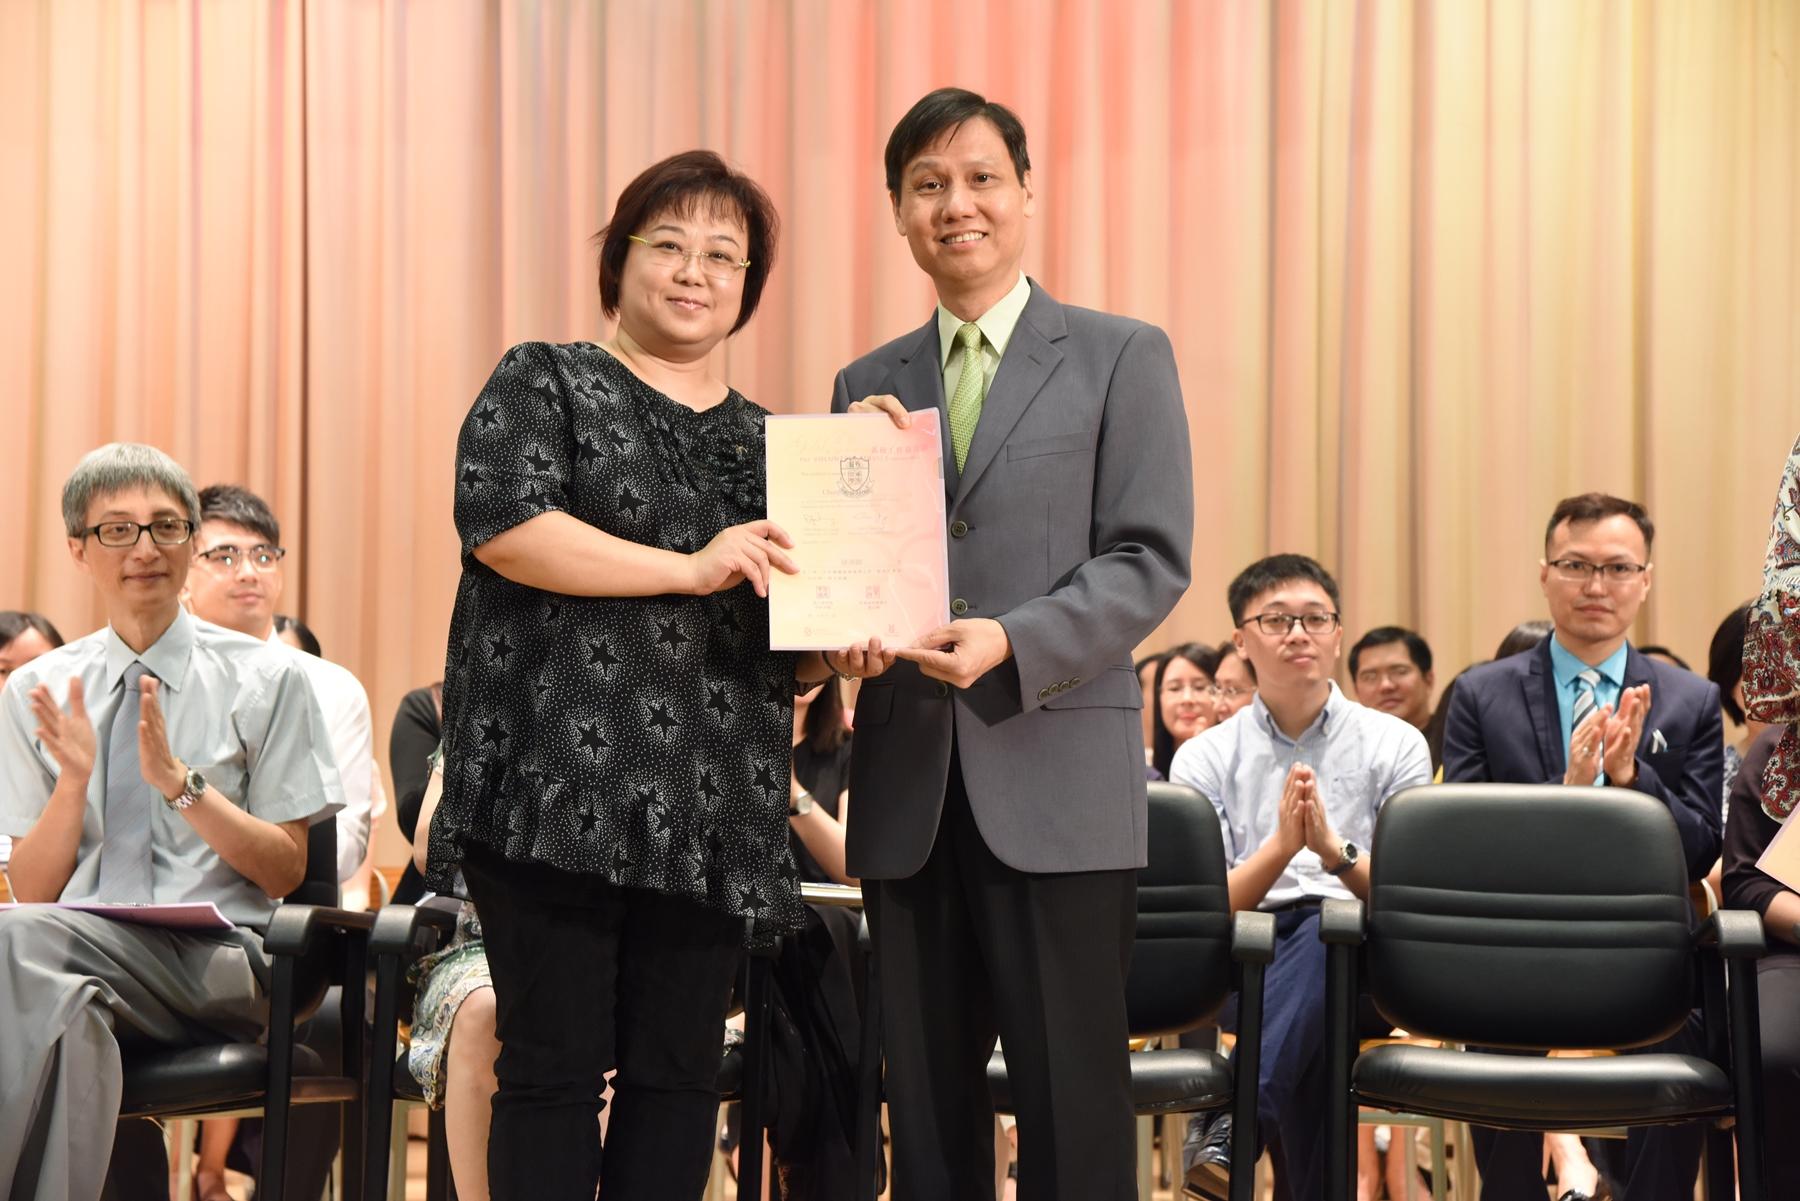 http://www.npc.edu.hk/sites/default/files/dsc_0012.jpg